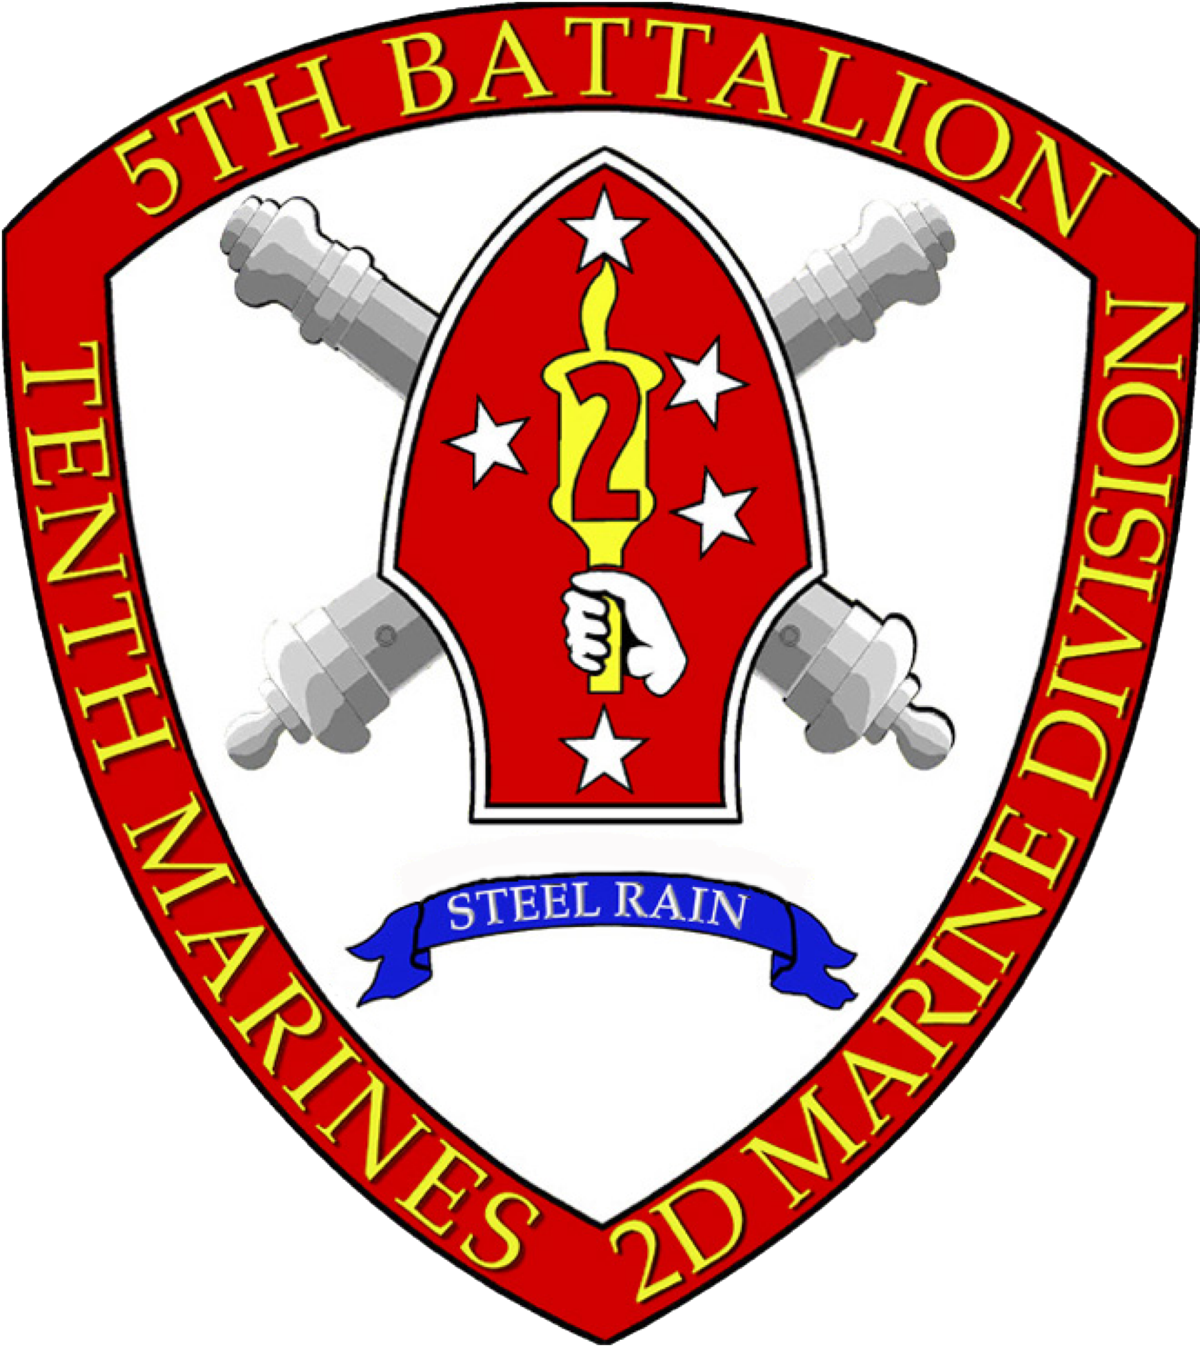 5th Battalion, 10th Marines - Wikipedia